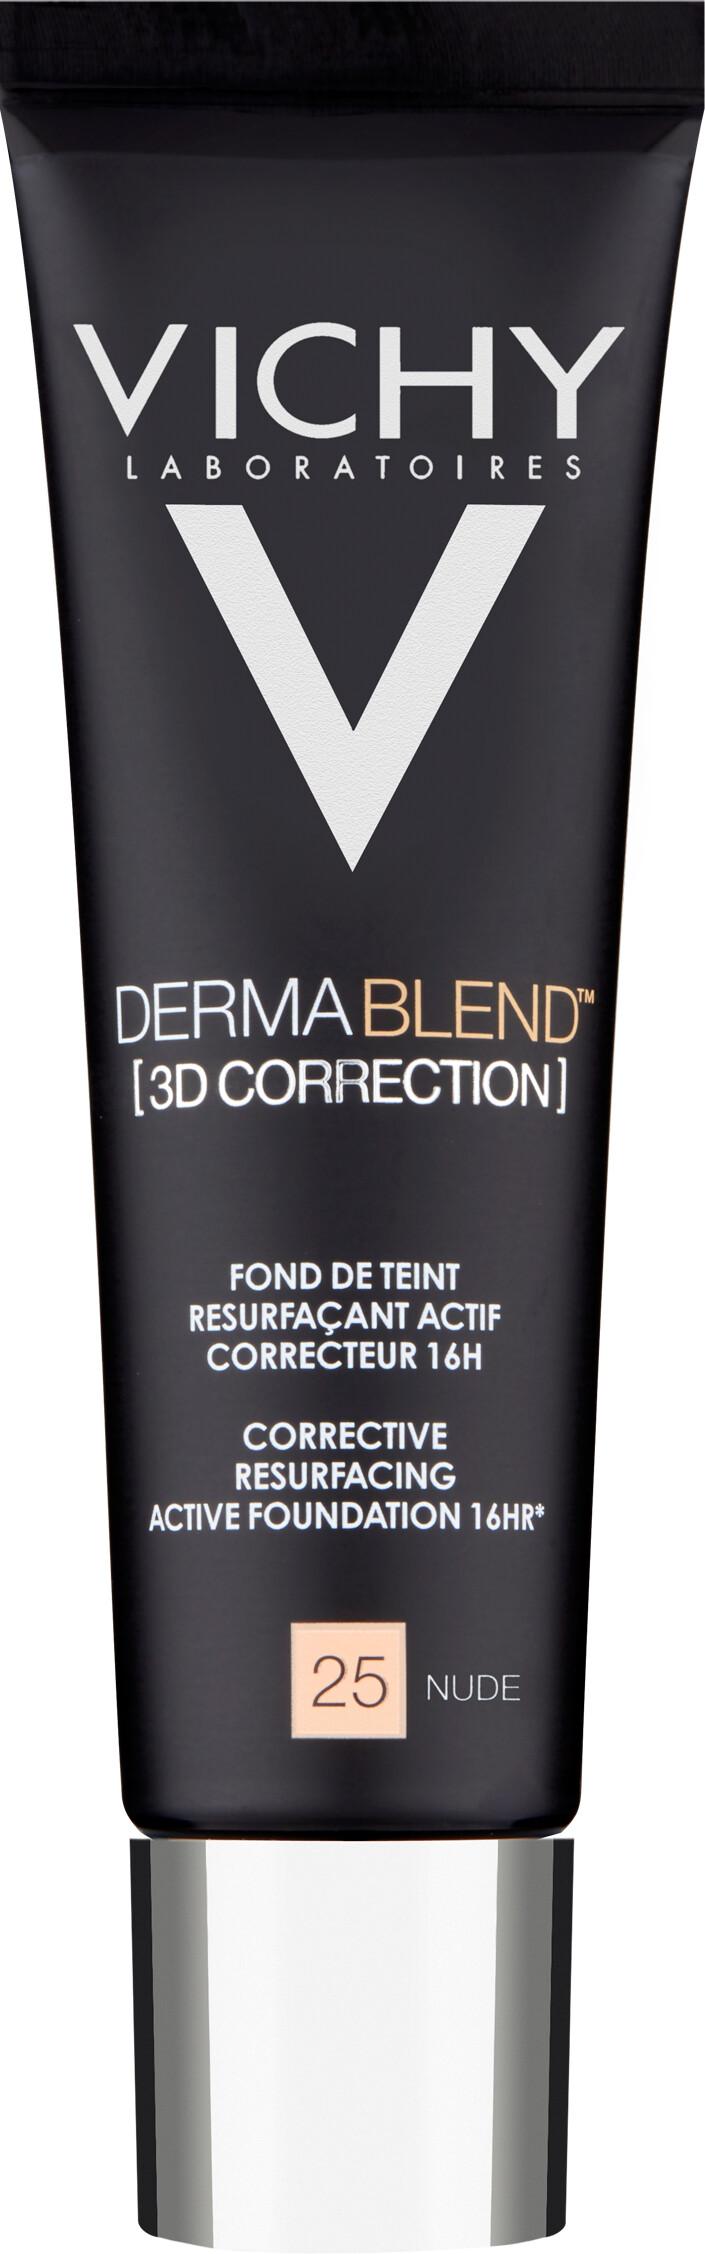 VICHY DERMABLEND [3D CORRECTION] Corrective Resurfacing Active Foundation 16HR* 30ml 25 Nude